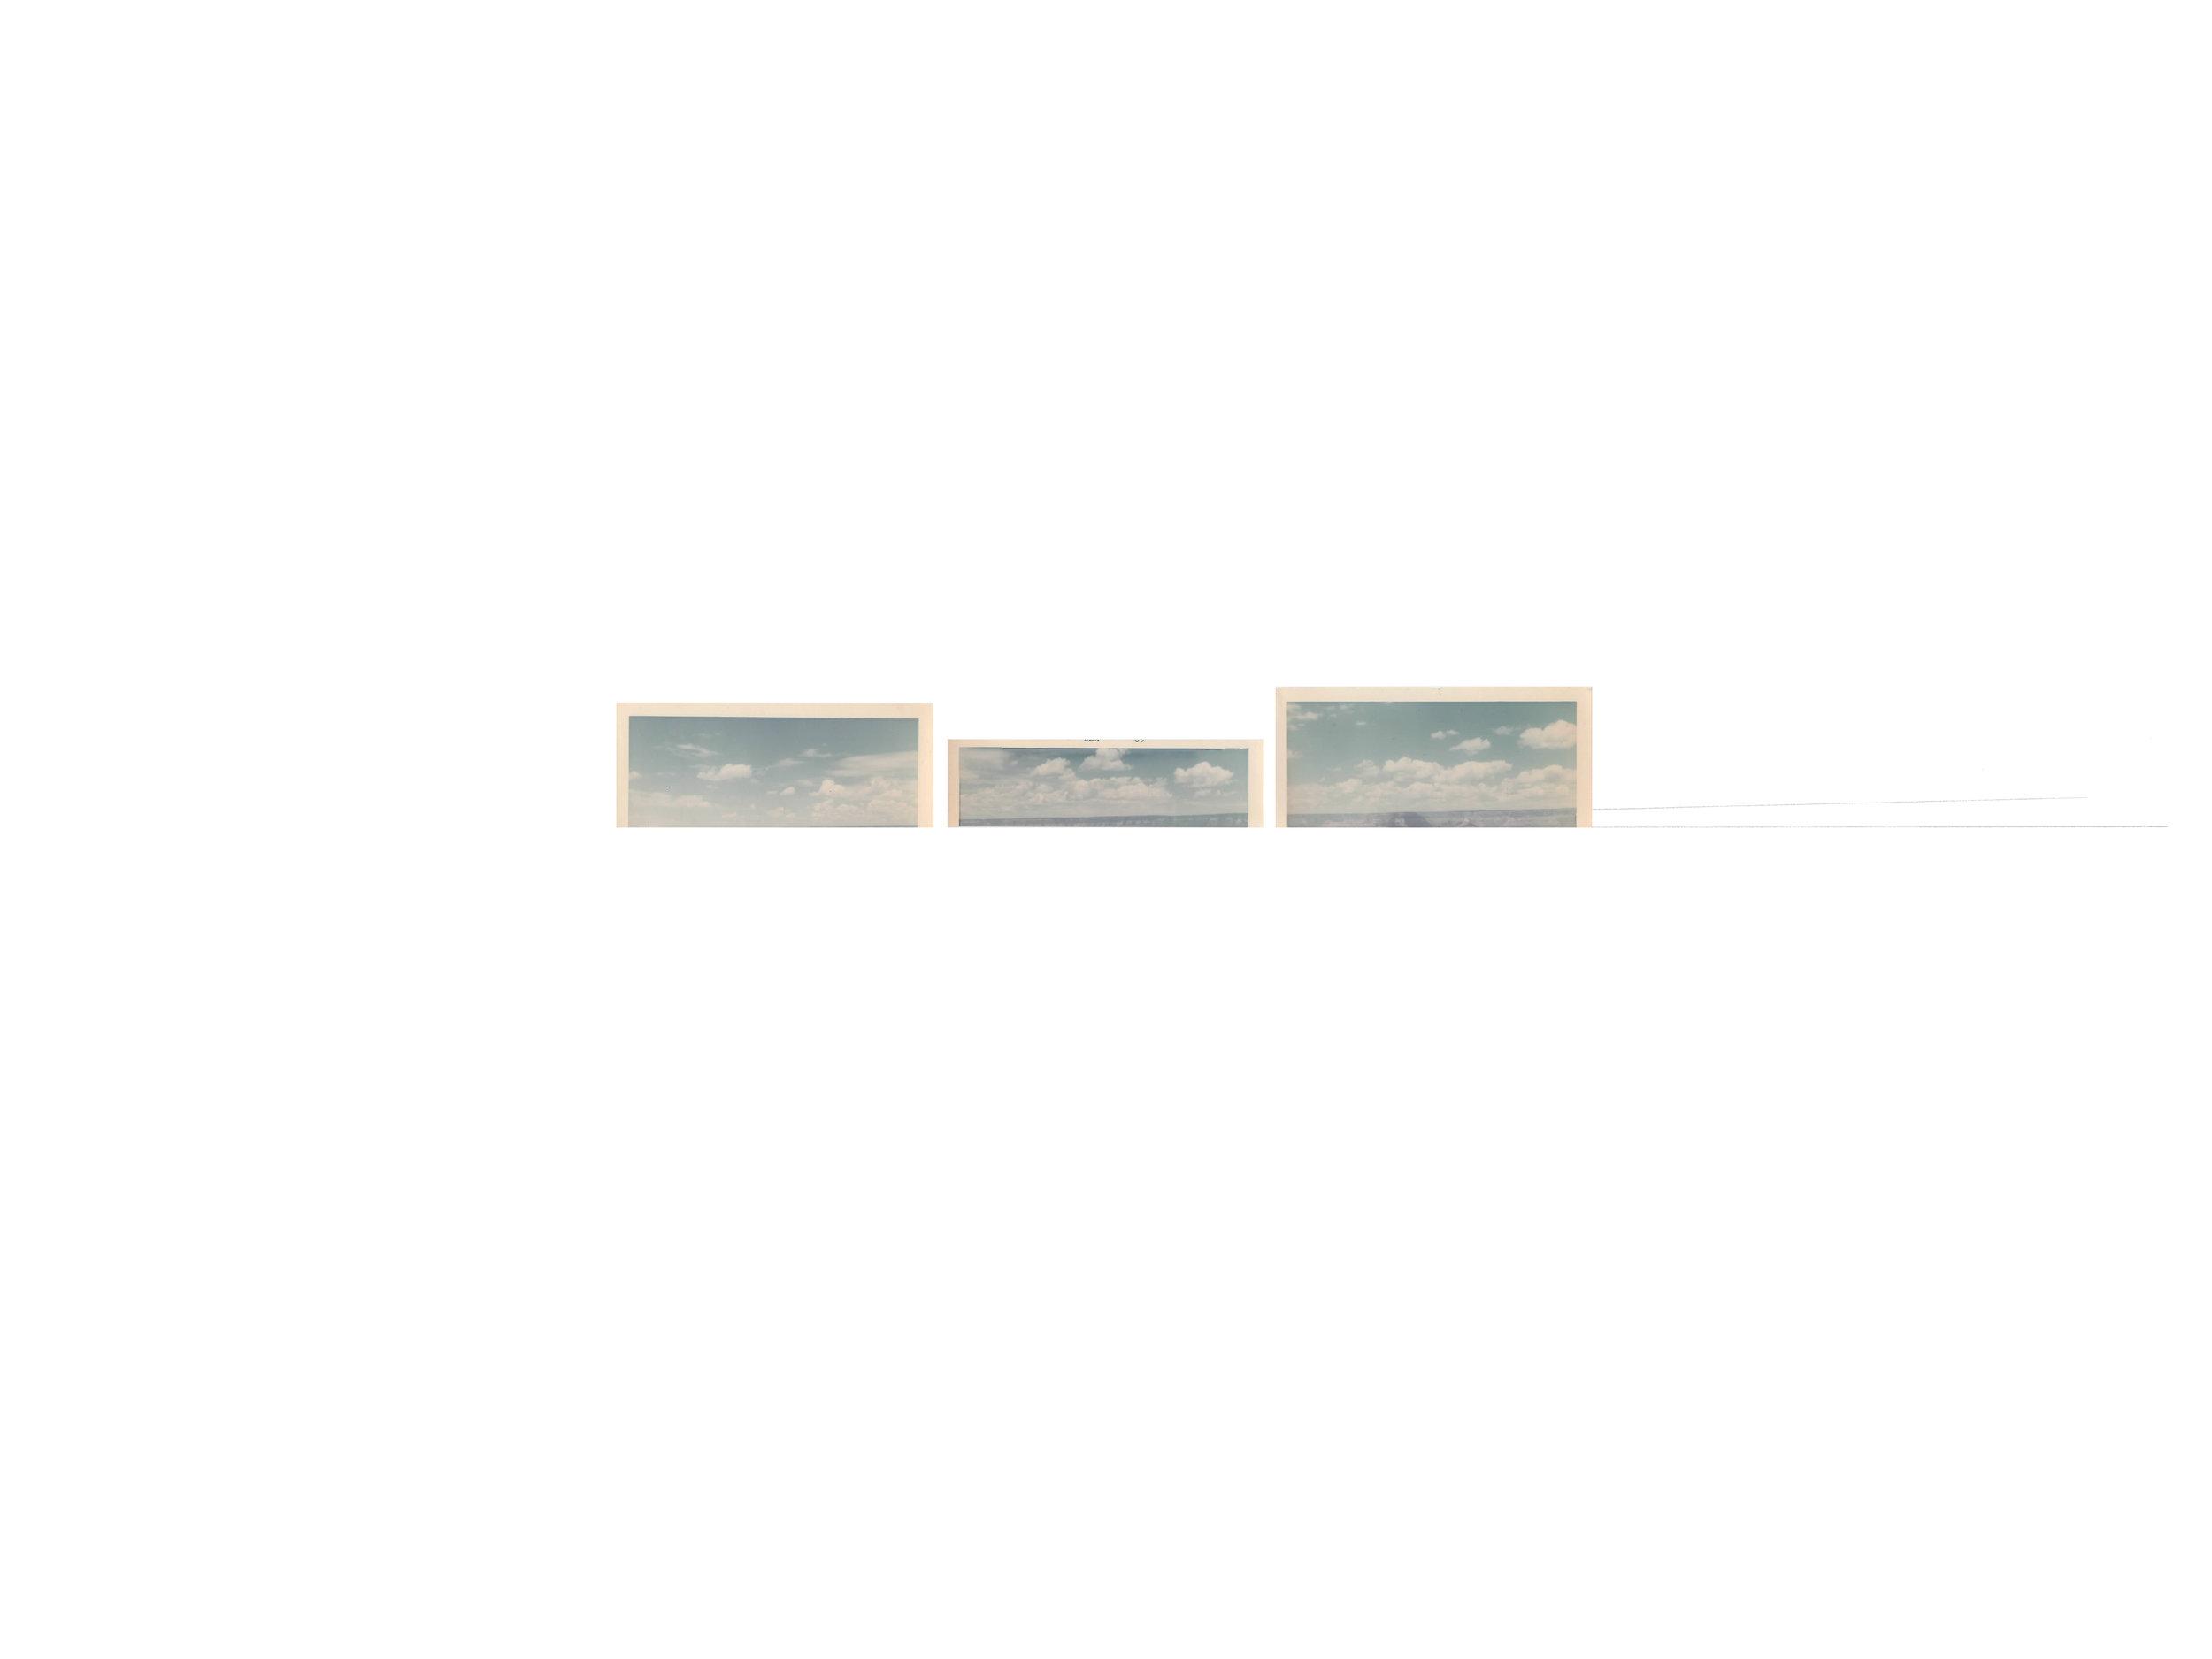 Westward Yearning No. 16  18 x 24 inches | 2018